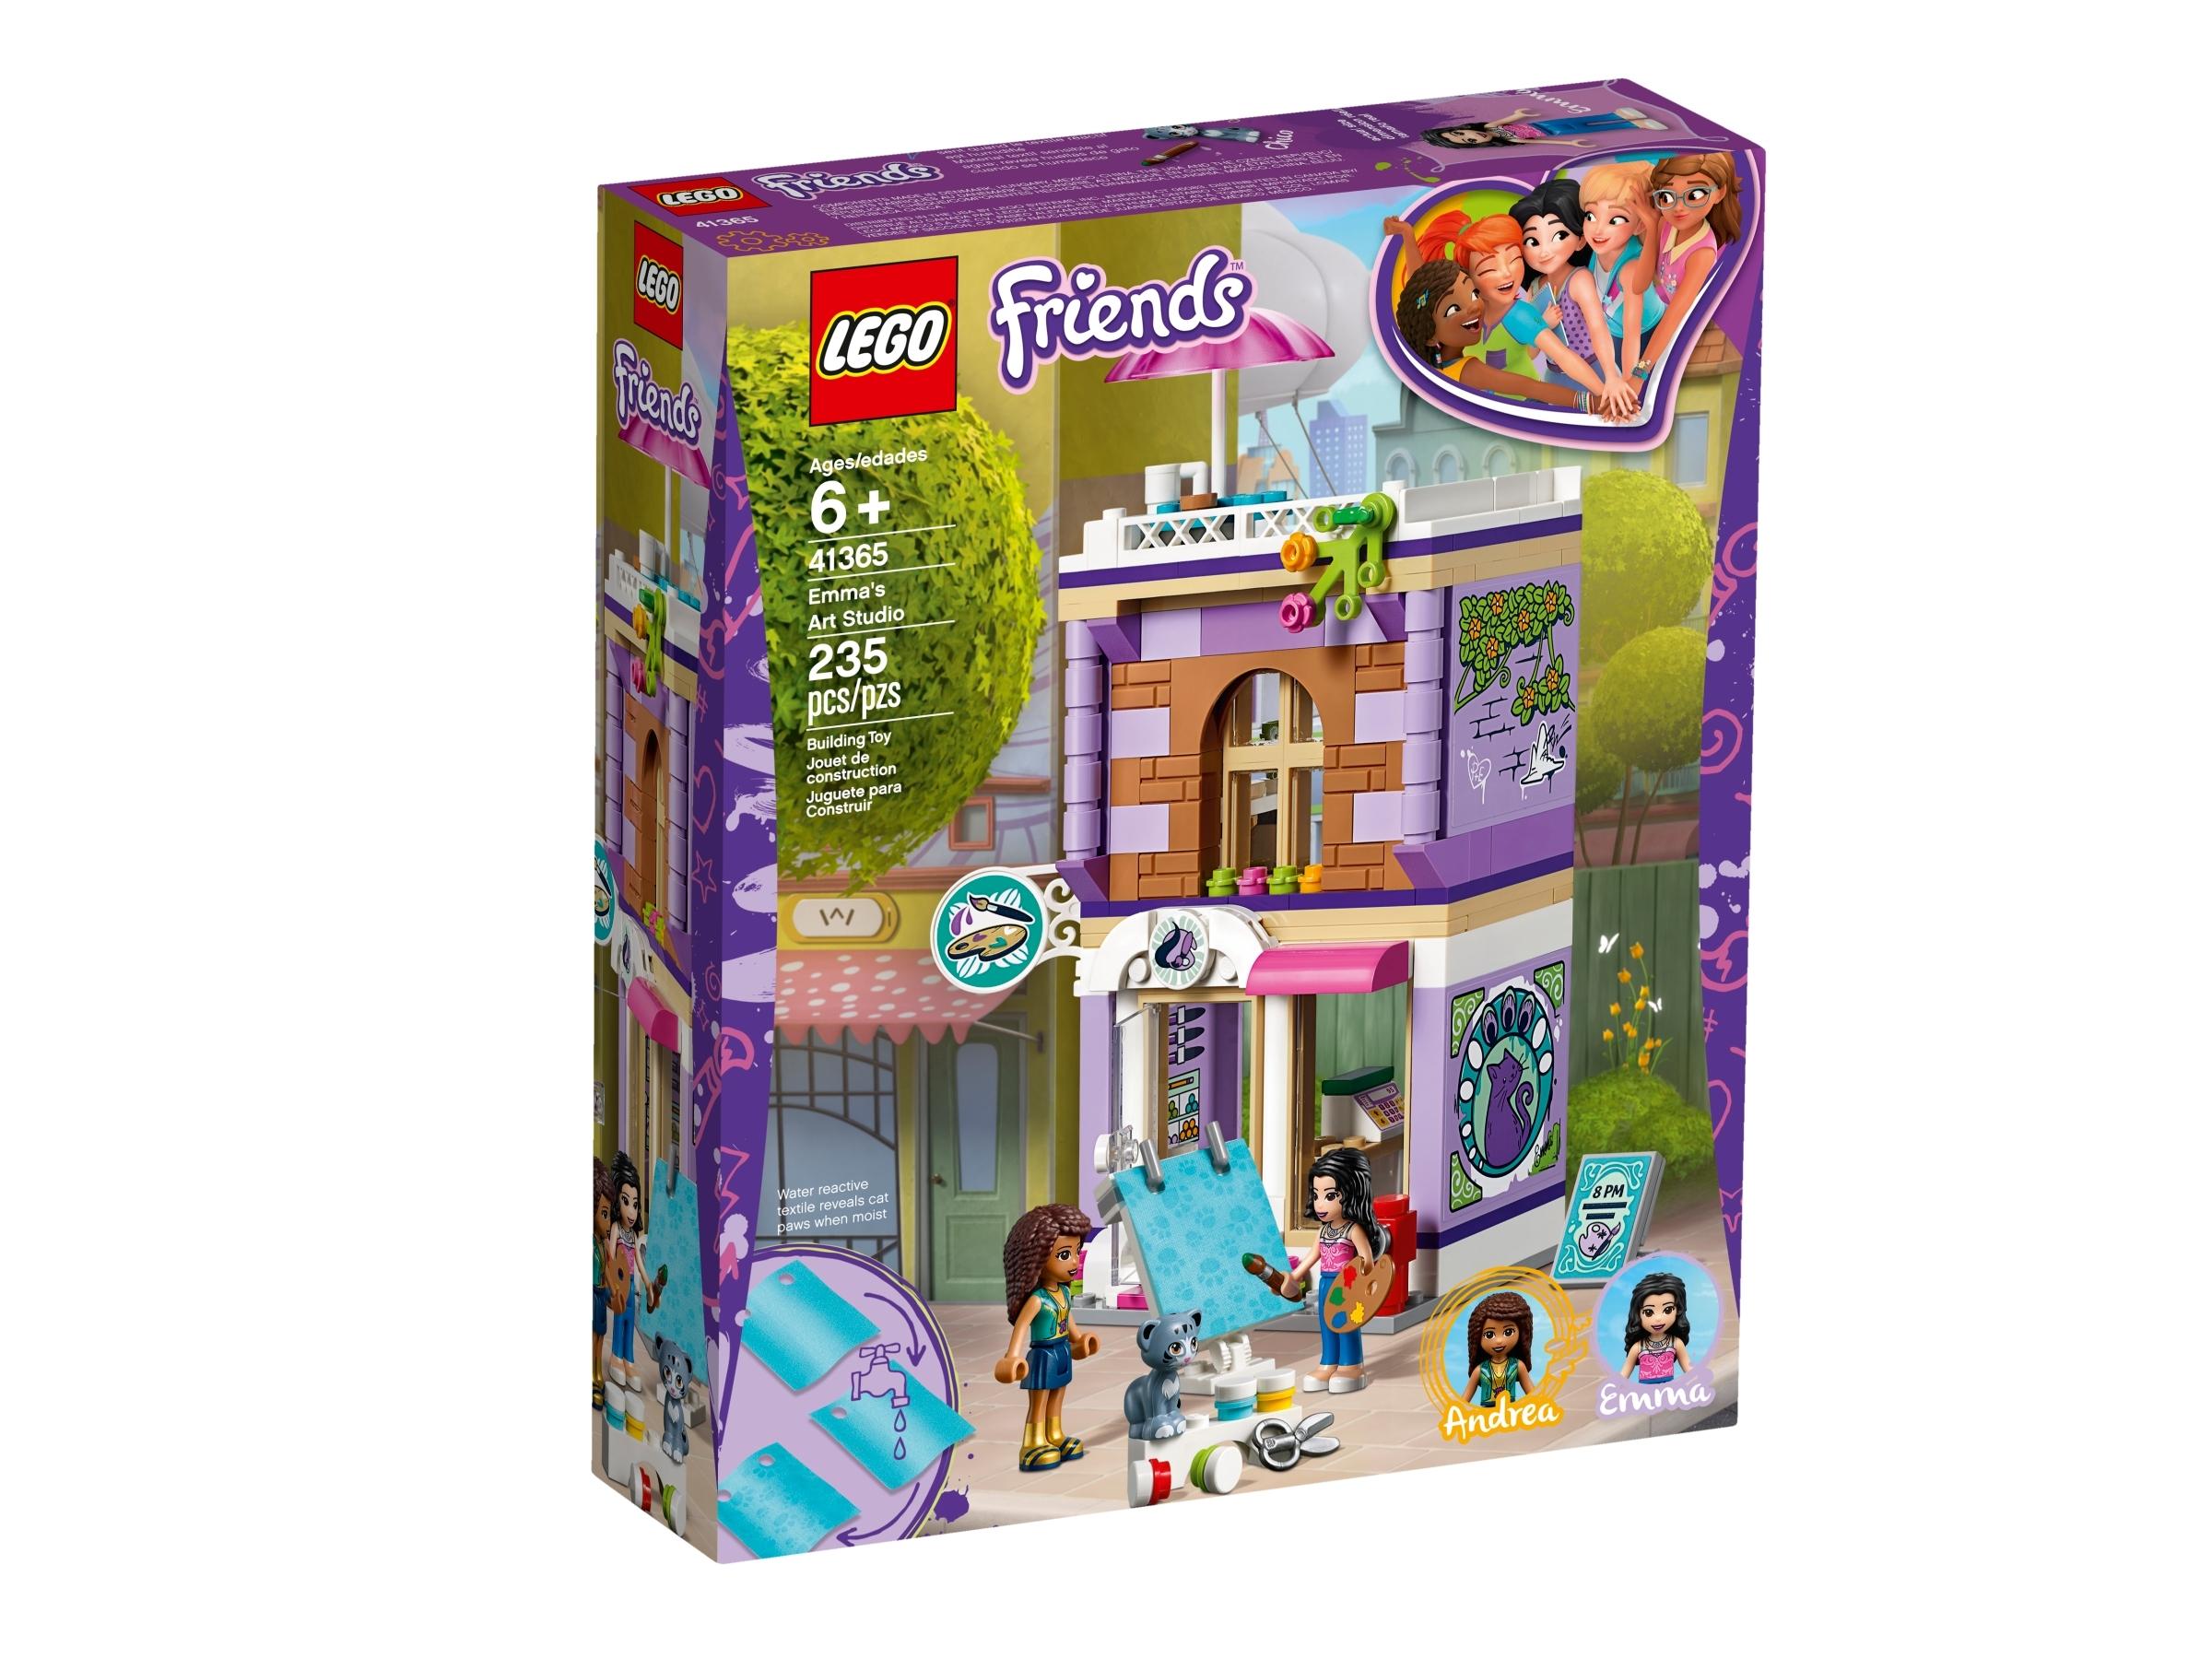 Emma S Art Studio 41365 Friends Buy Online At The Official Lego Shop Us